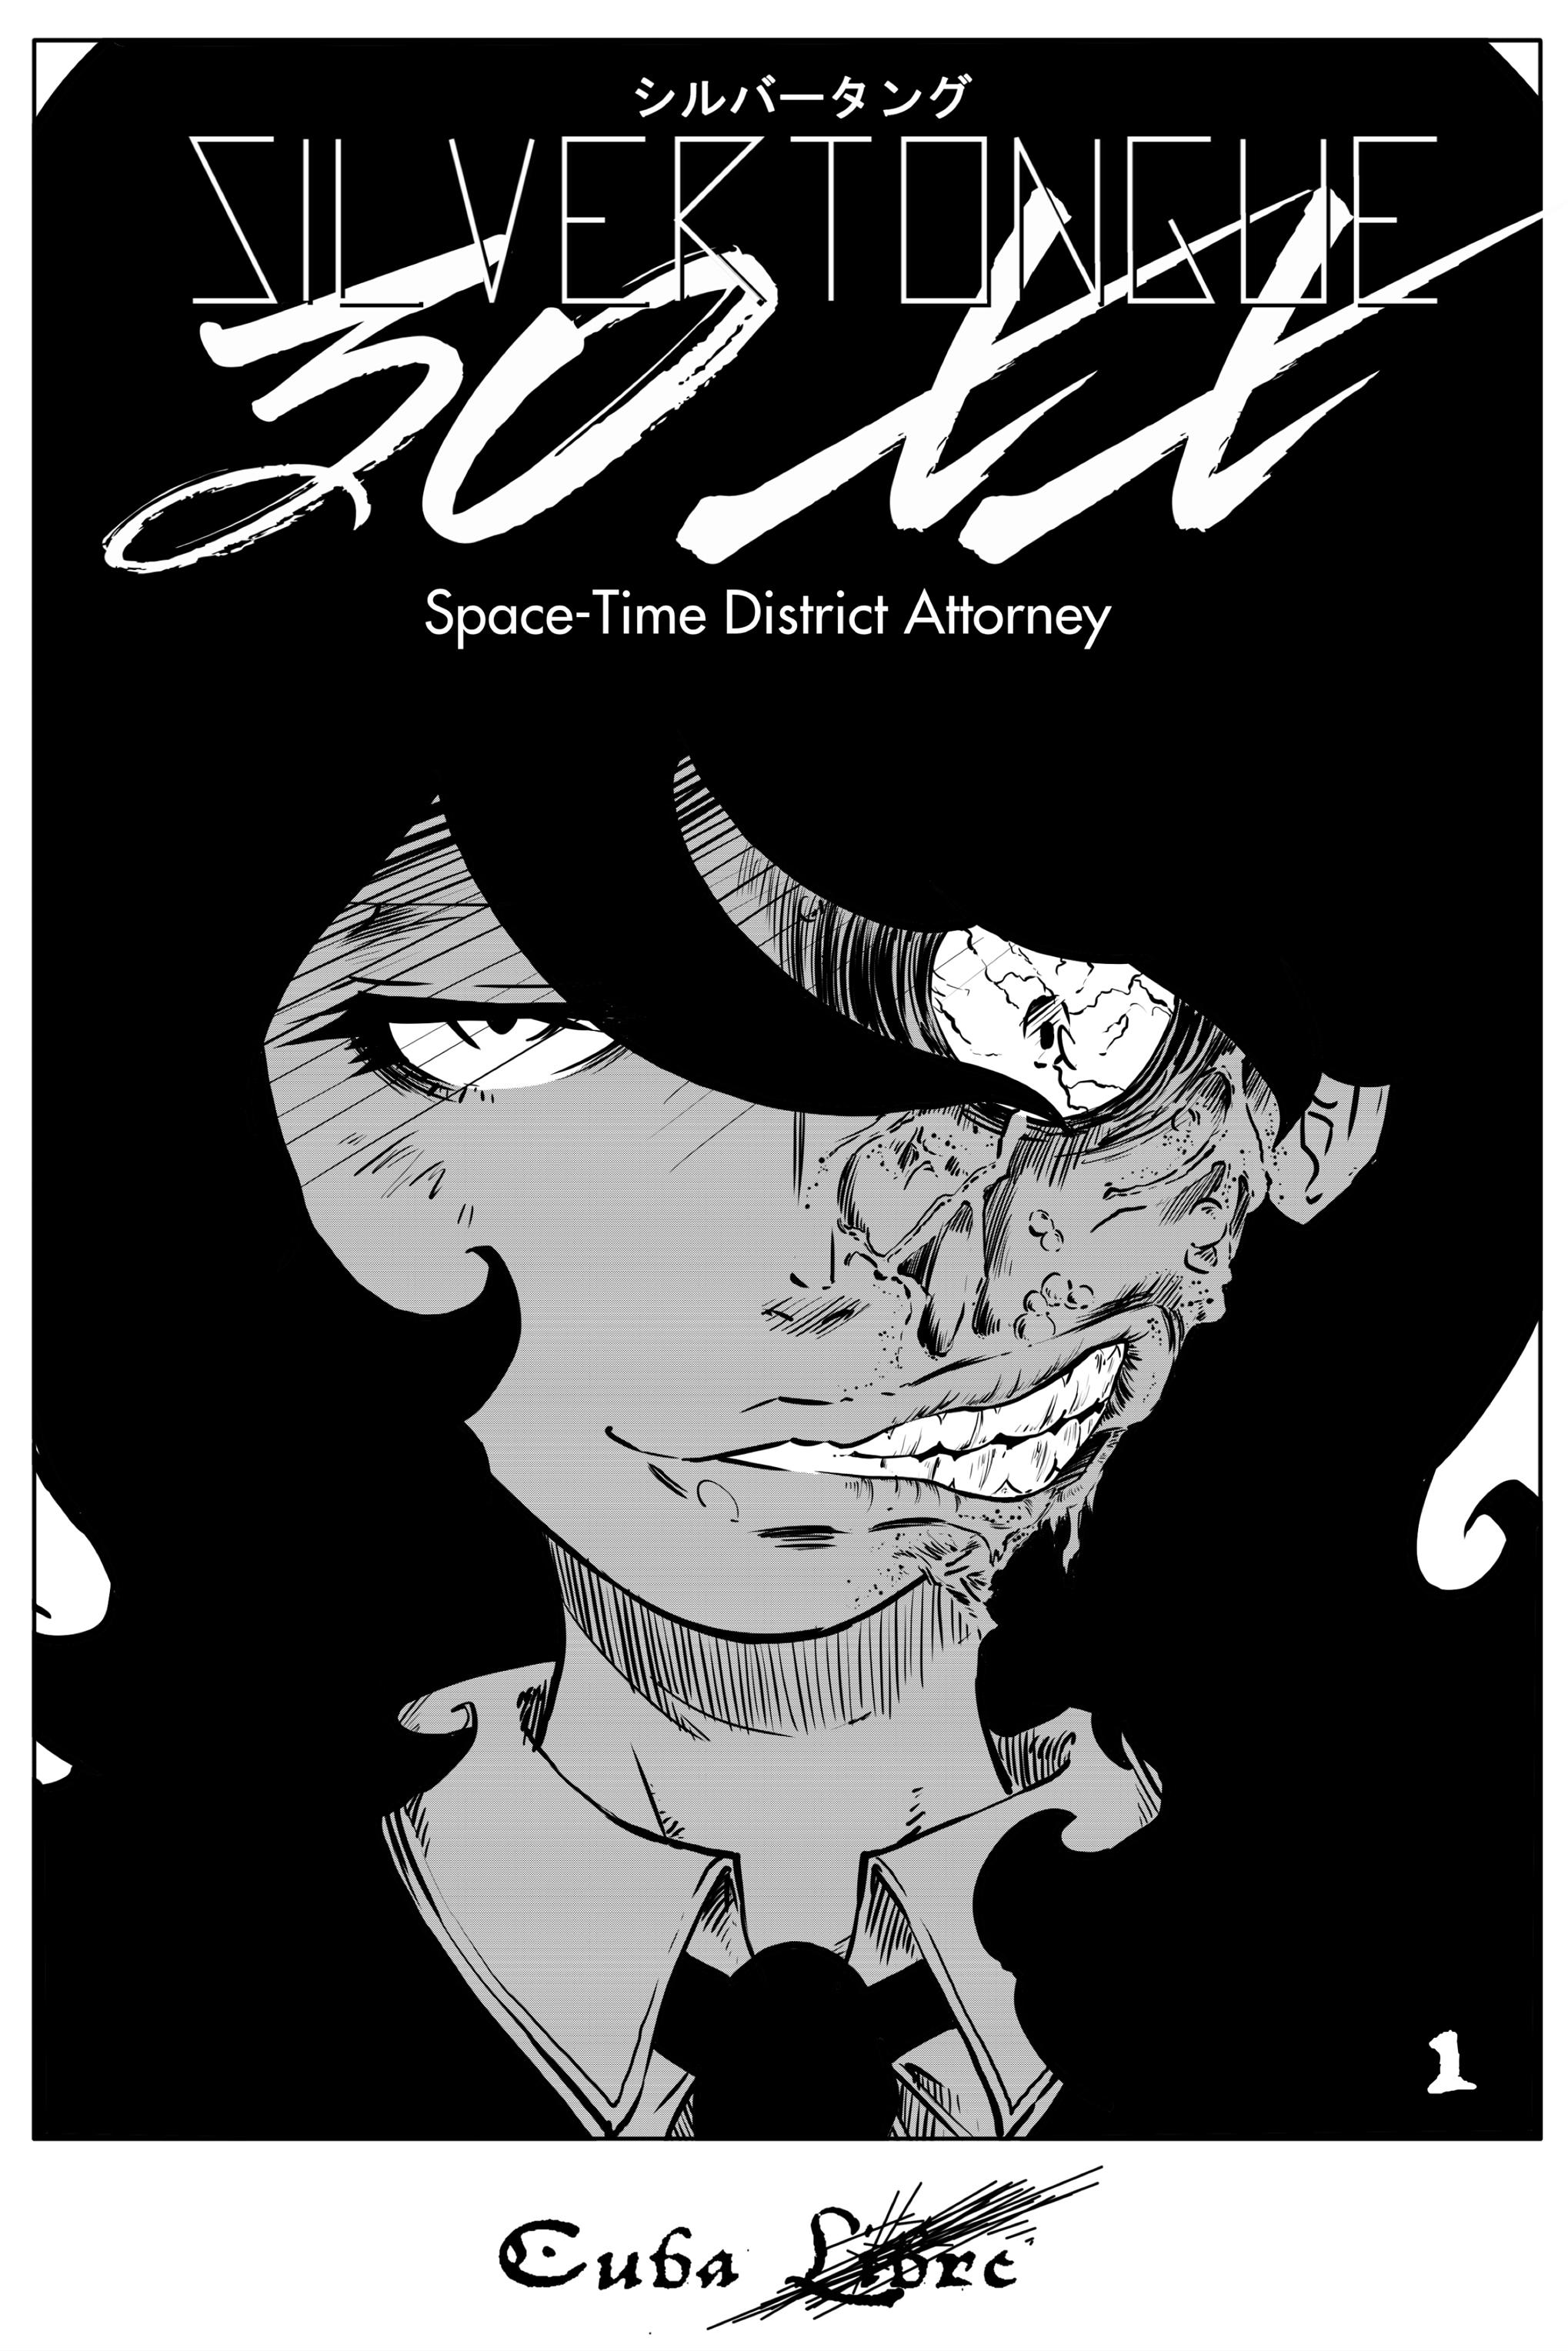 Read online Silvertongue 30xx Vol. 3 comic -  Issue # Full - 1